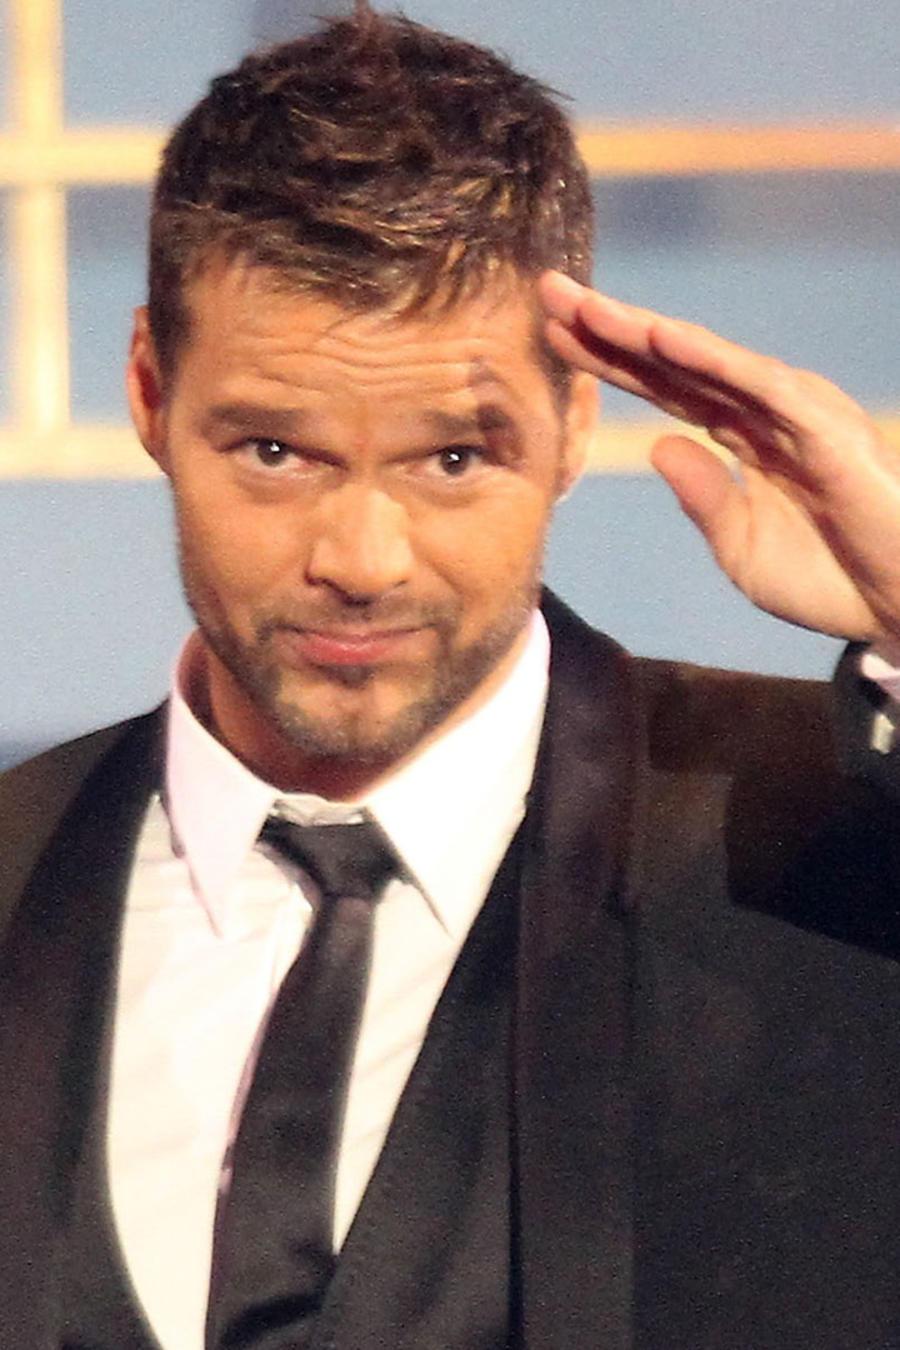 Ricky Martin en los Premios Billboard Latin 2010